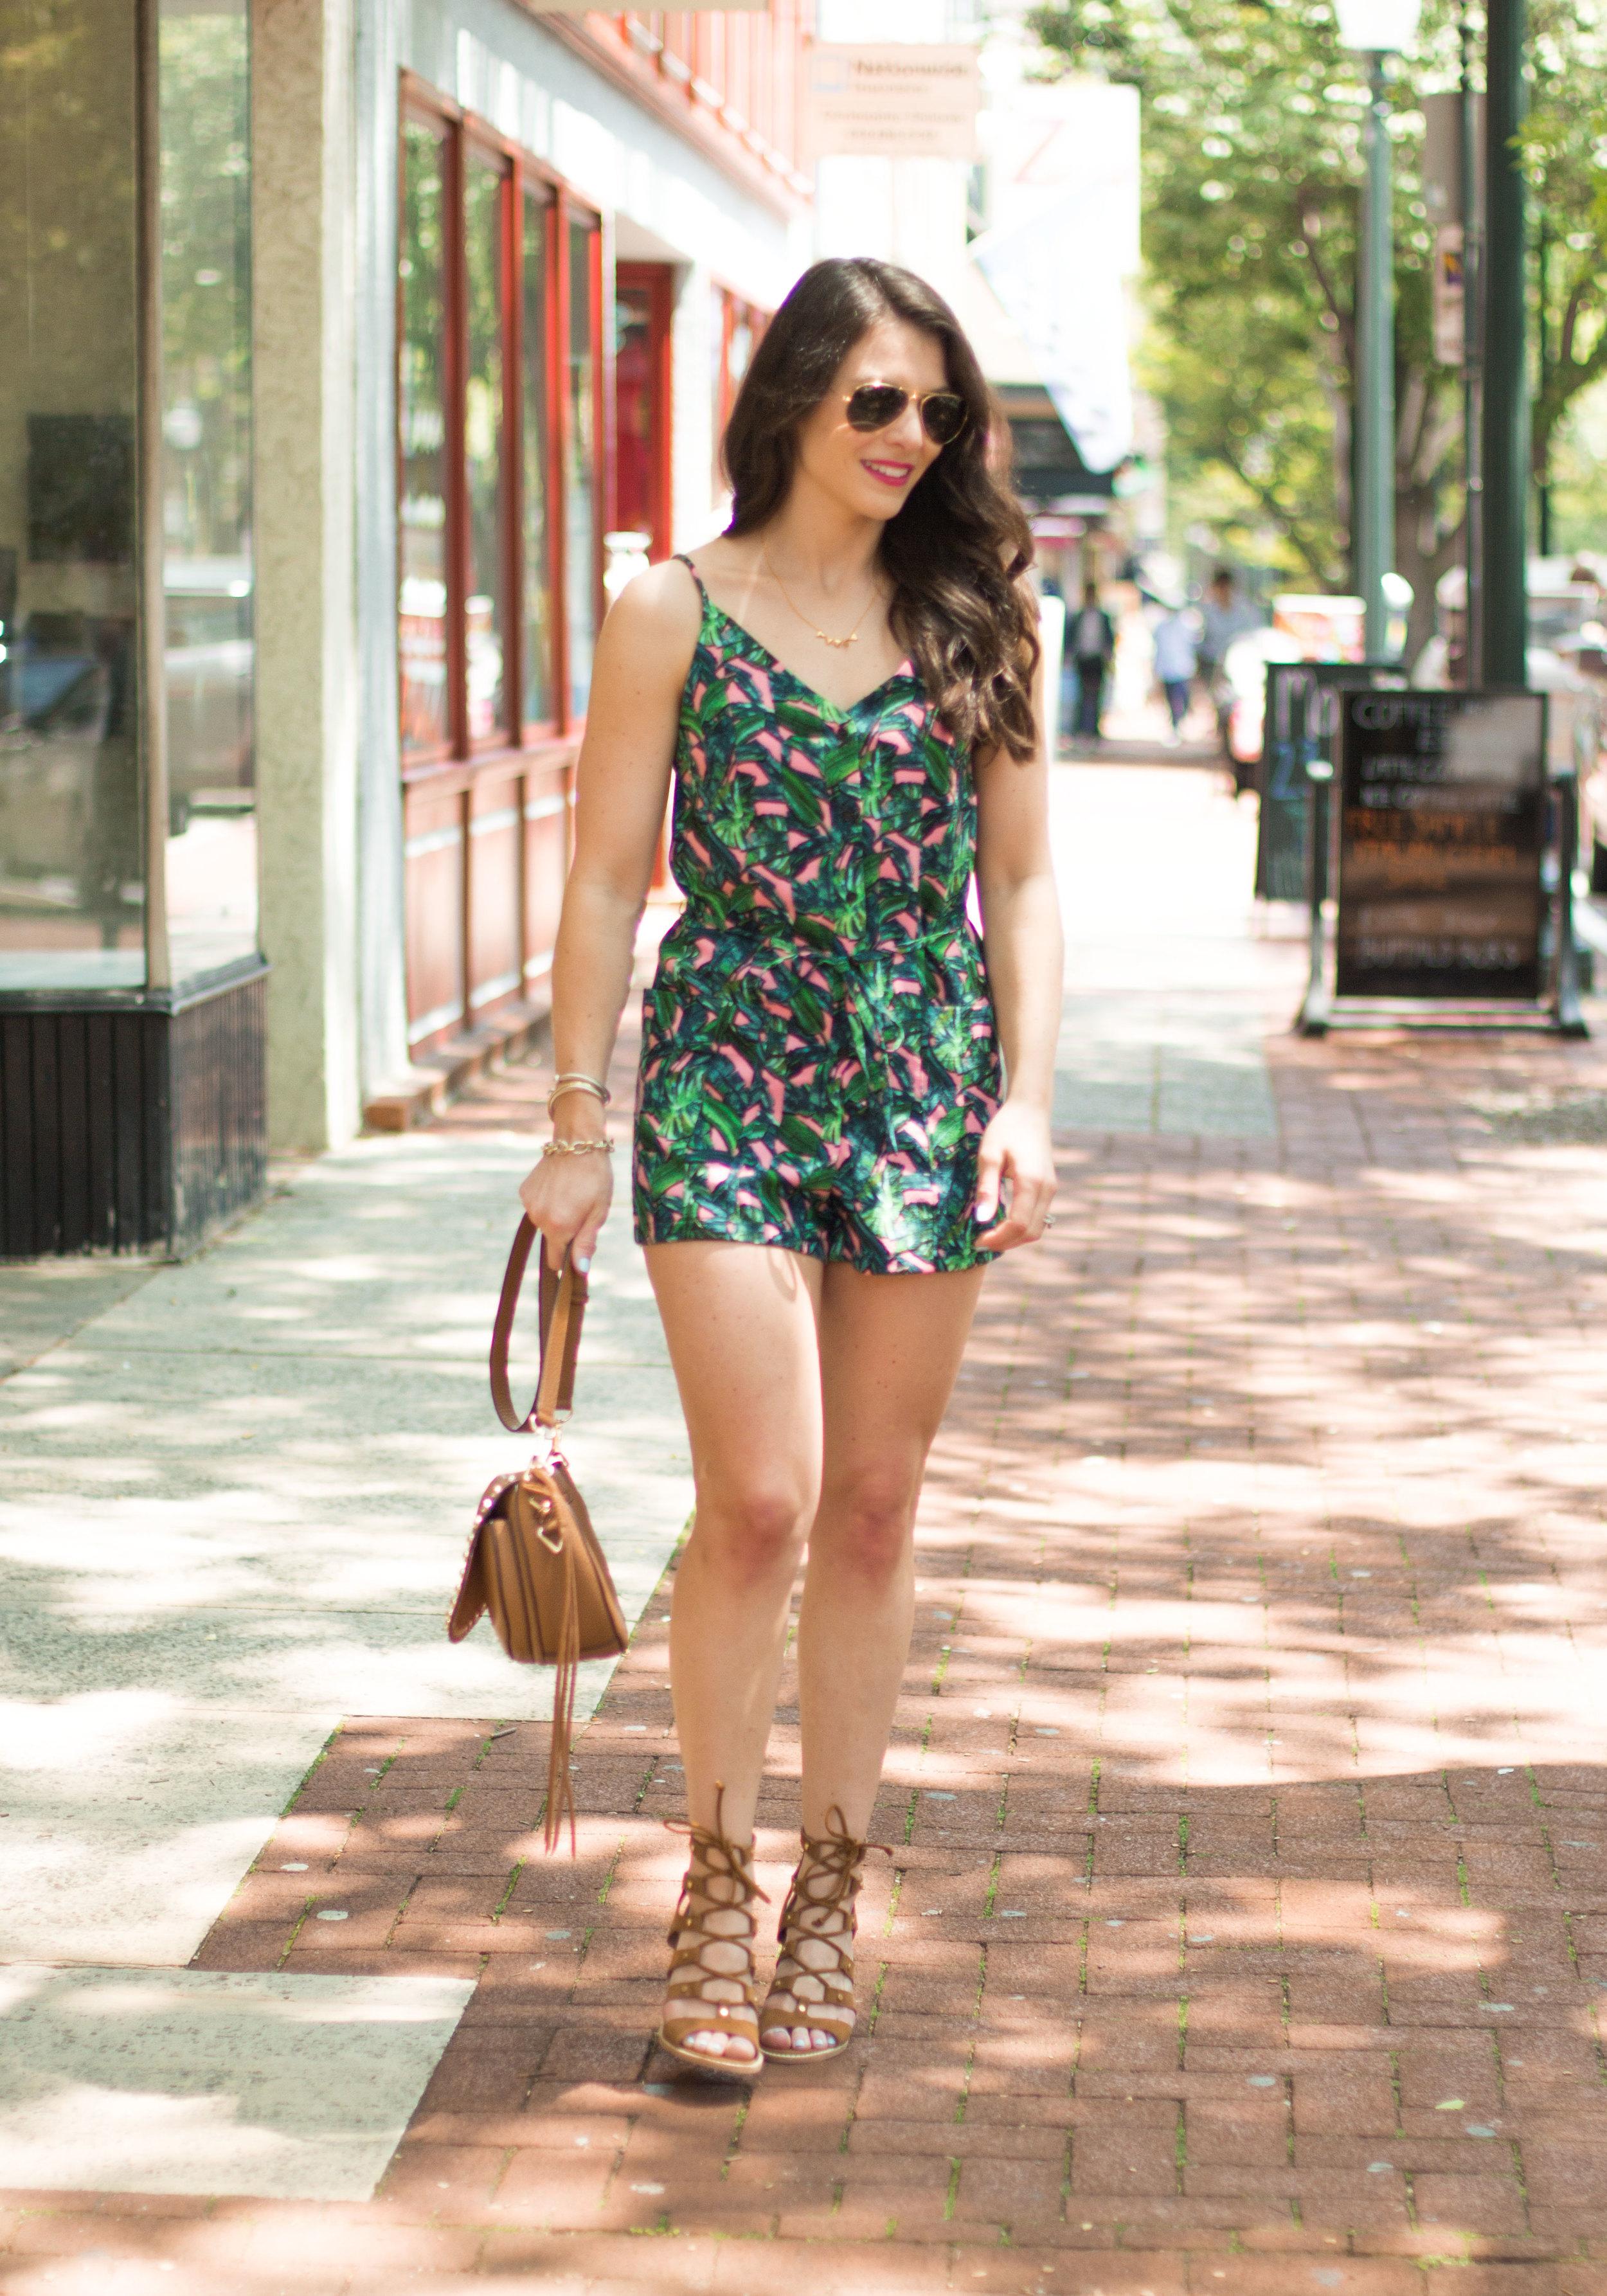 Topshop leaf print romper, Dolce Vita Lyndon sandals, Rebecca Minkoff unlined saddle bag, Ray-ban aviator sunglasses, cute summer outfits!